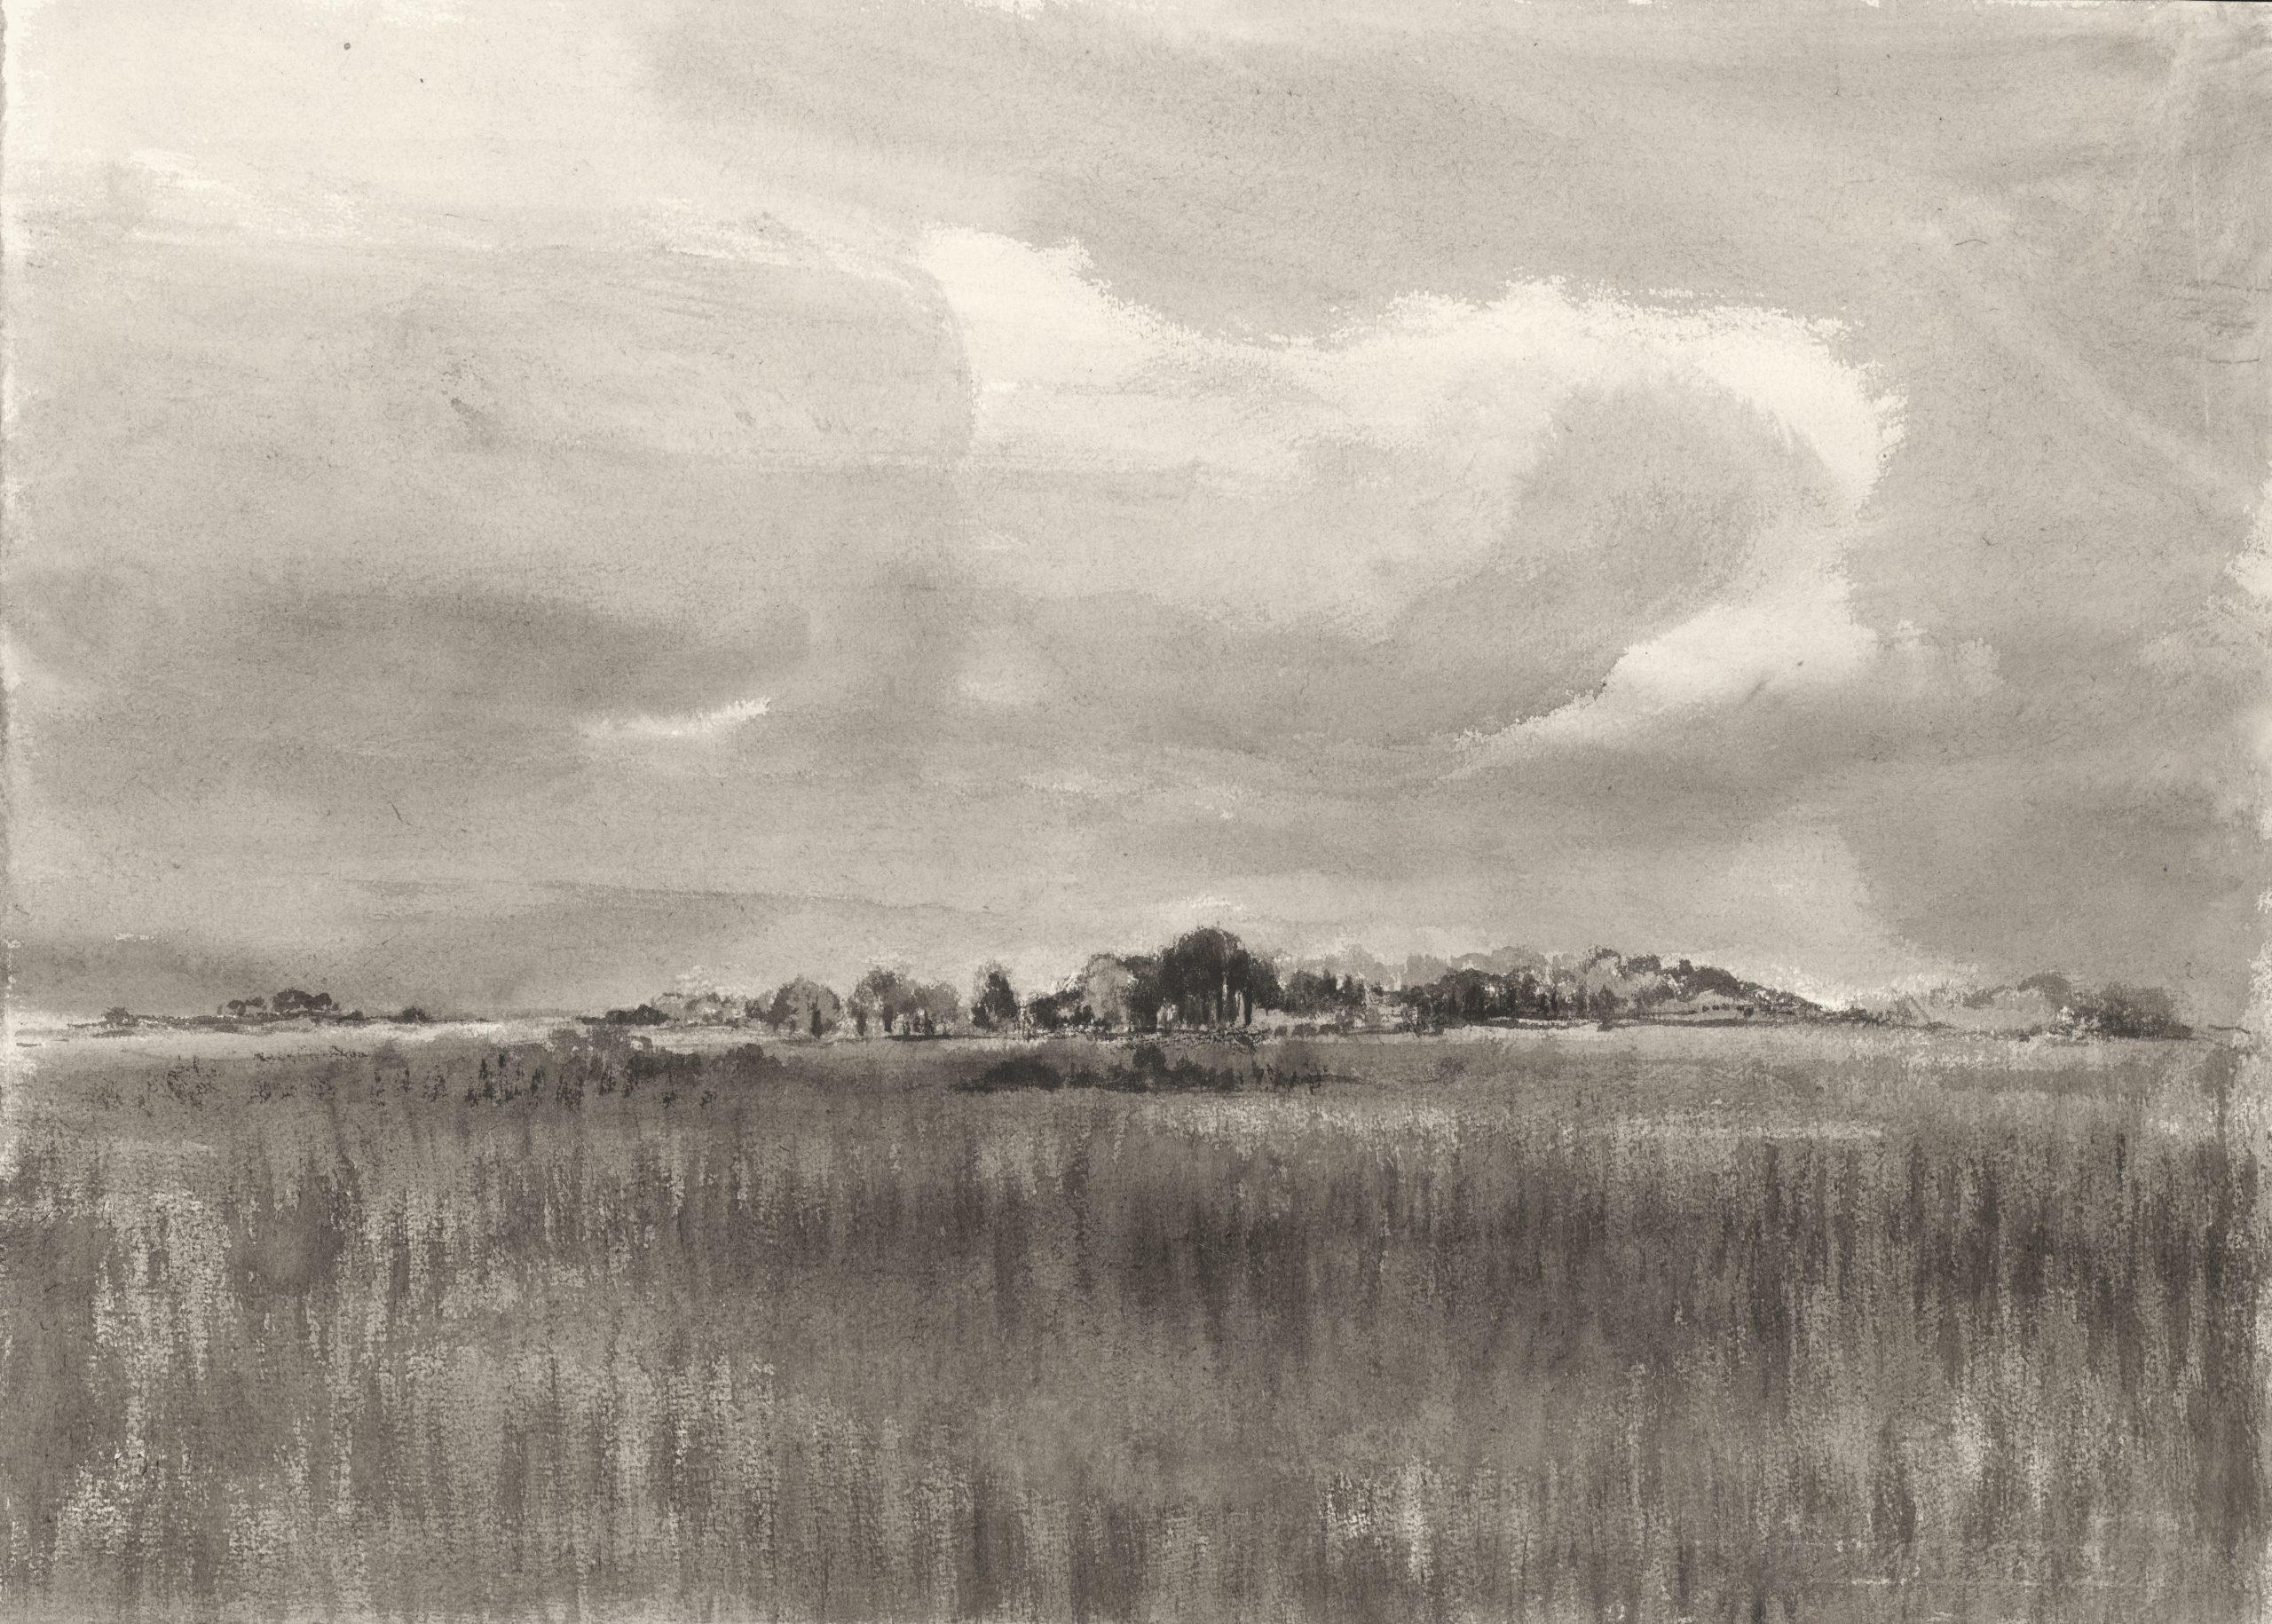 Mazovia, 40x50cm, ink, paper, 2017